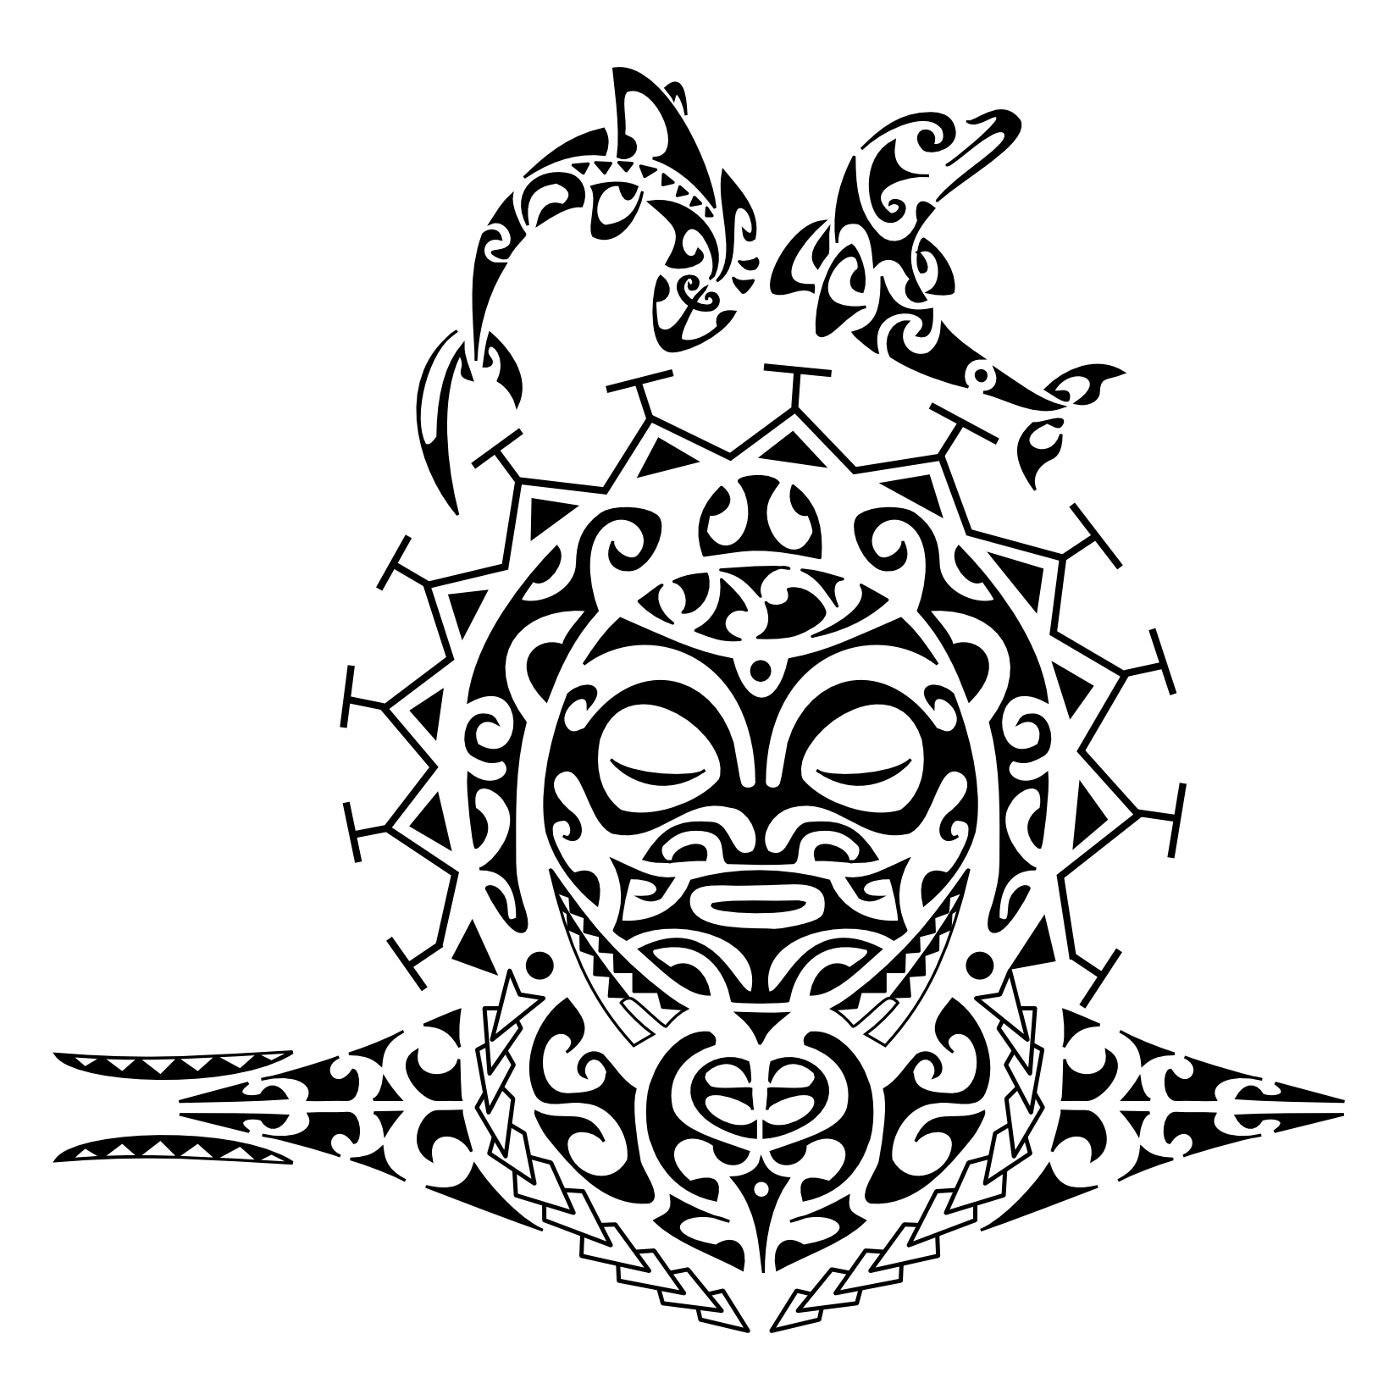 http://1.bp.blogspot.com/_RaCDK1xl35Y/TO6X4hZvrpI/AAAAAAAAA3U/Gz8KgnJHgwY/s1600/Tattoo%2B67.jpg